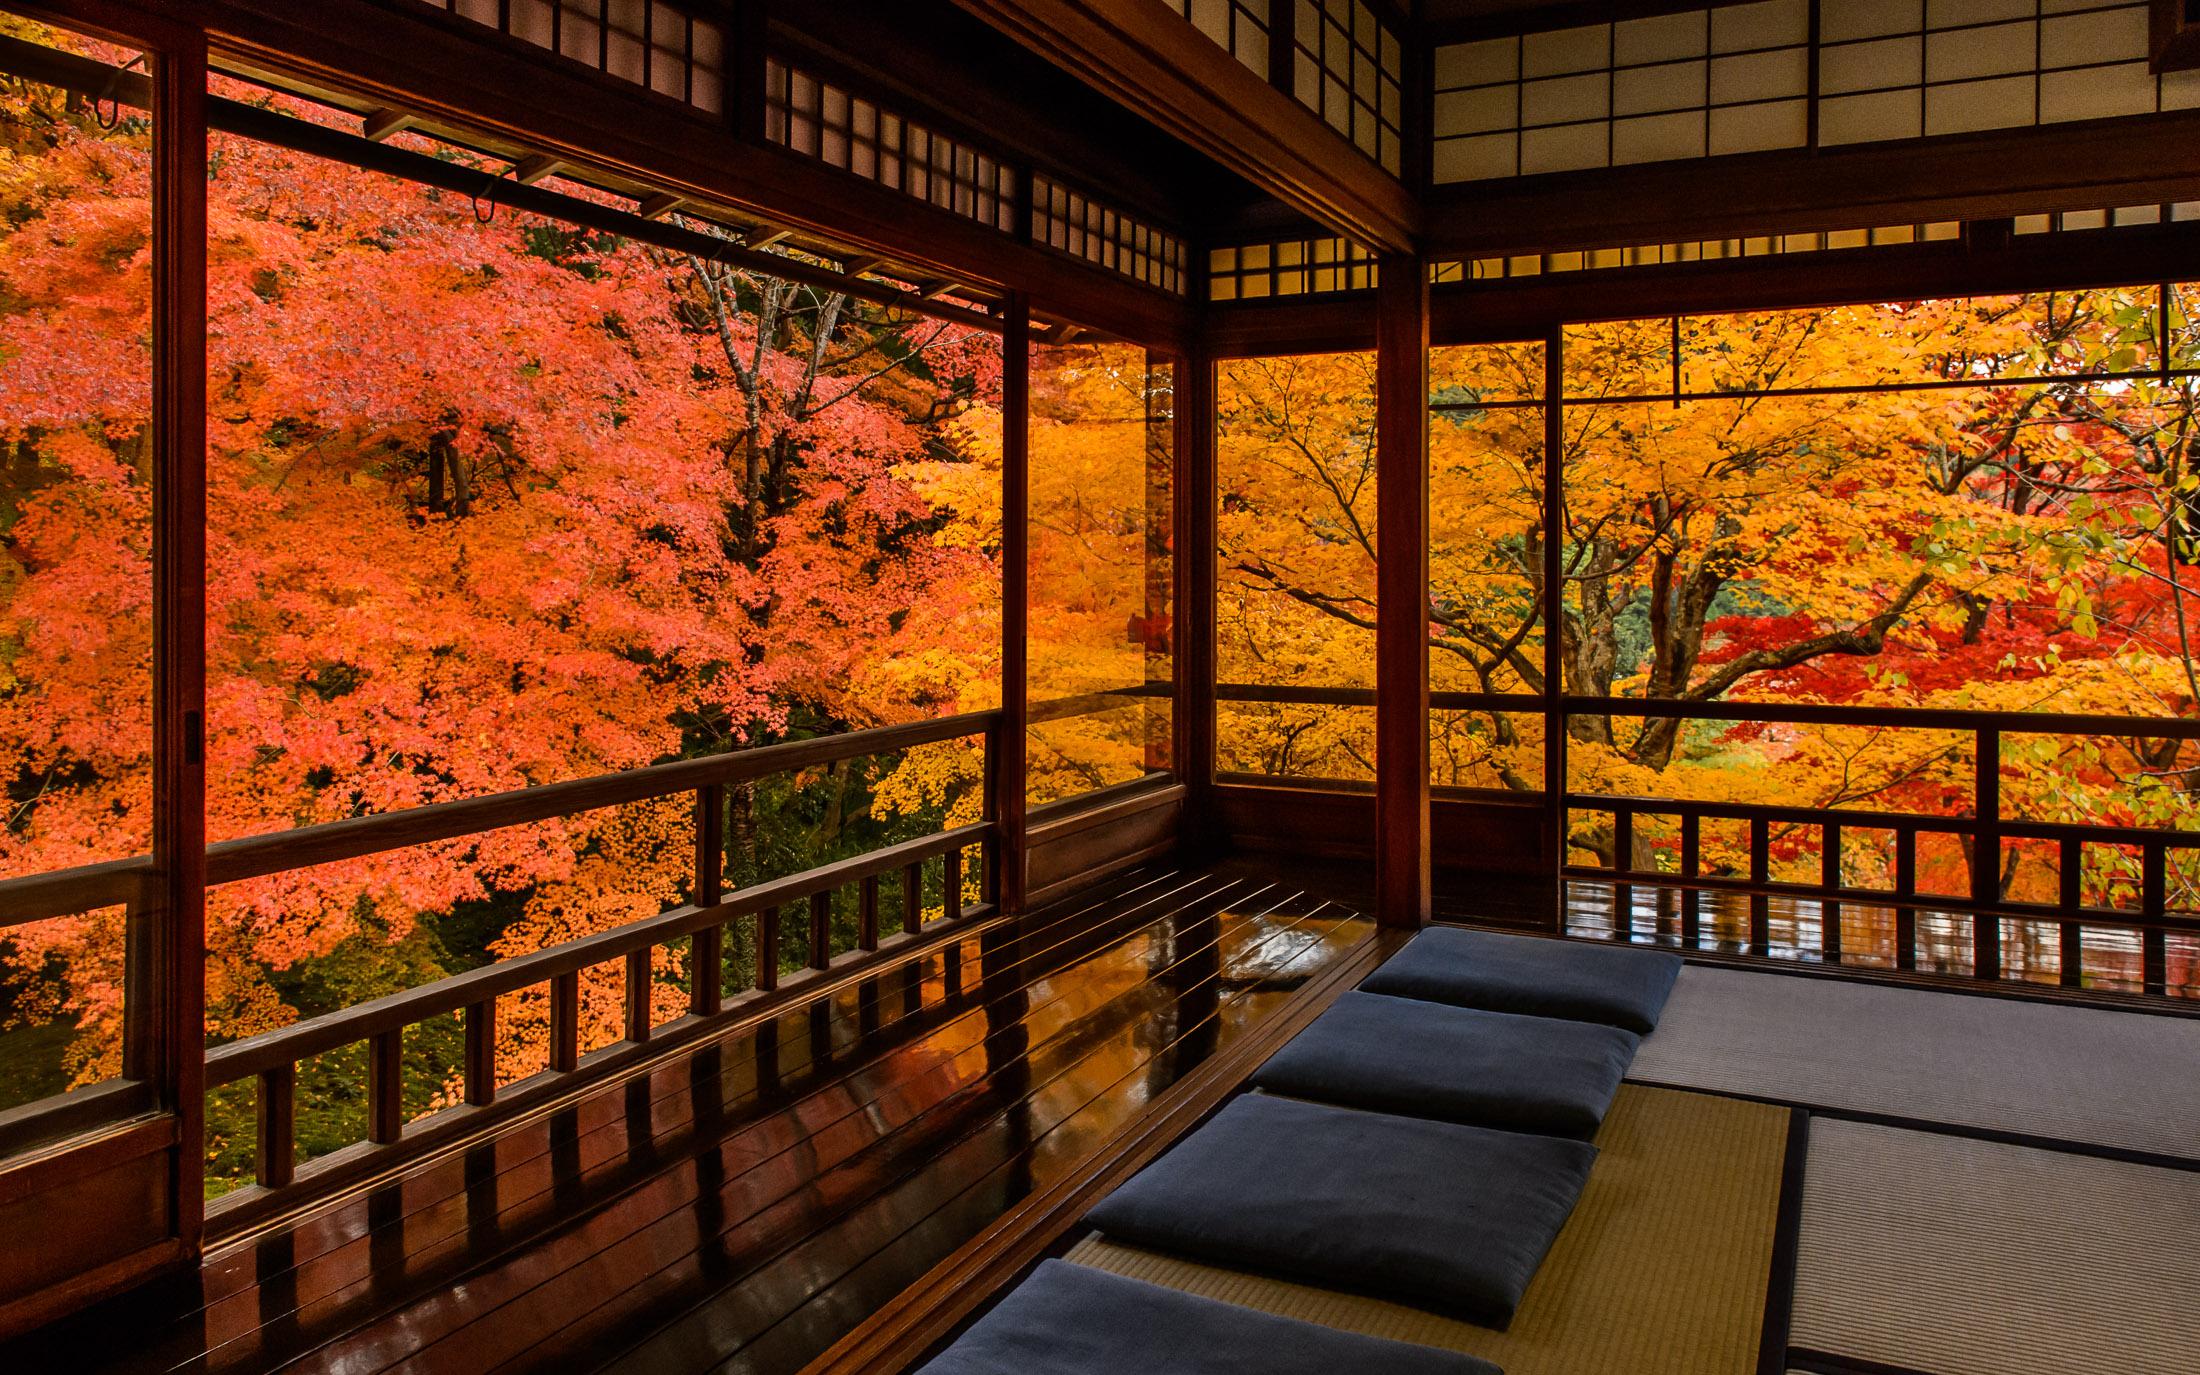 Fall Foliage Deskt Op Wallpaper Kyoto Photo Fall Colors From Inside Ruriko In Temple